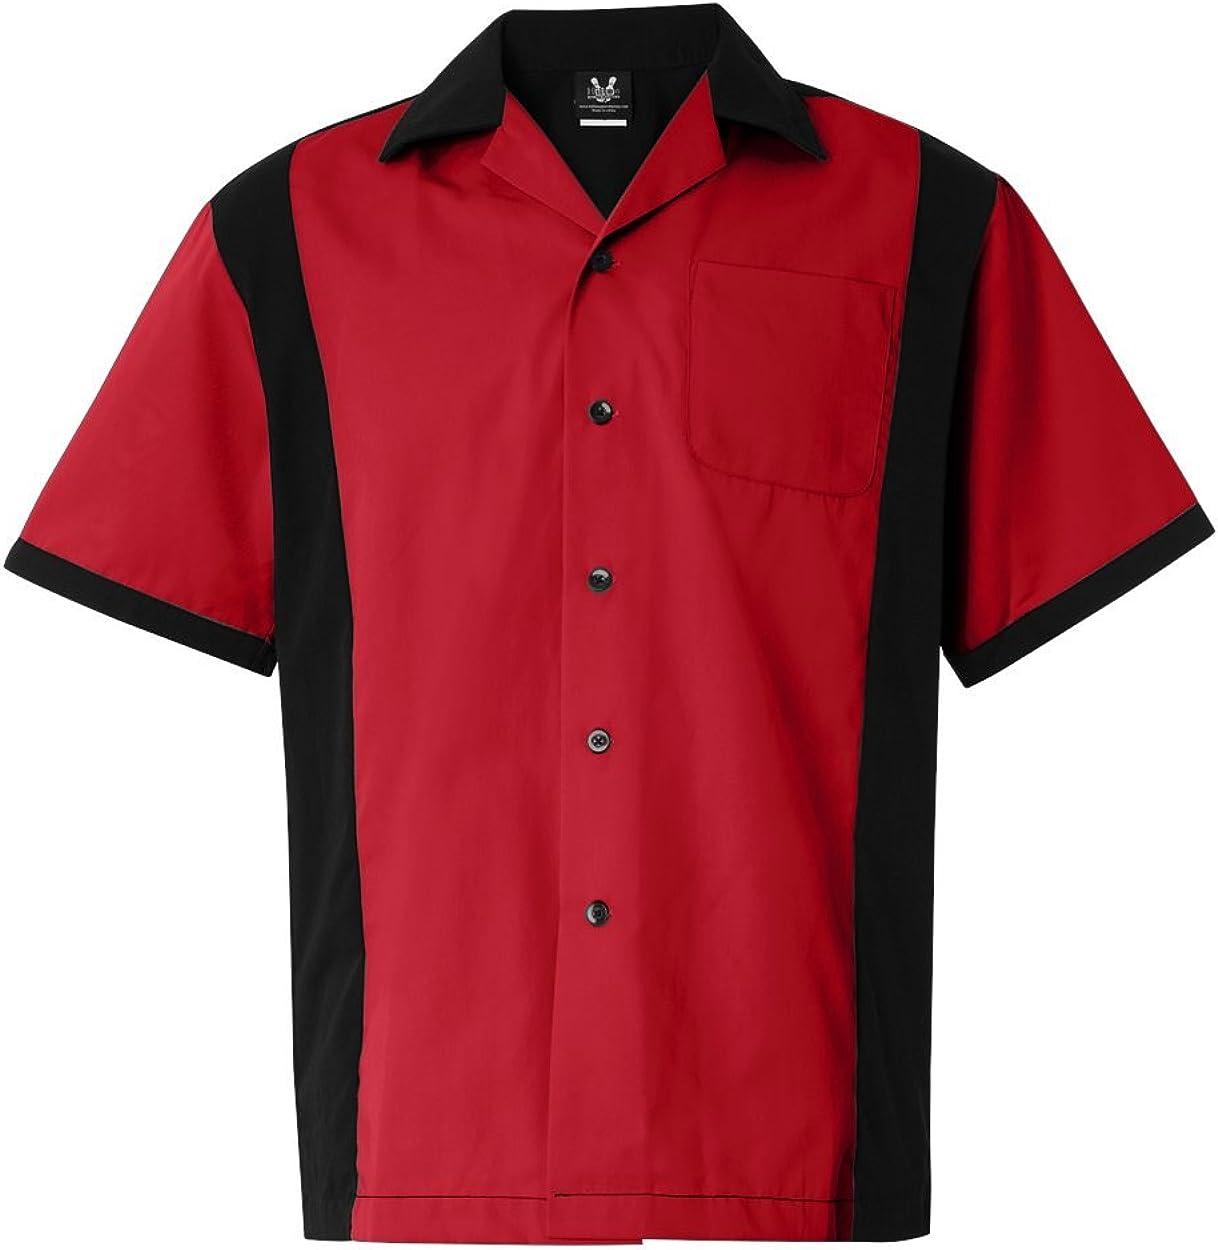 Hilton Men's HP2243 Cruiser Revere Collar Button Down 2-Tone Bowling Shirt